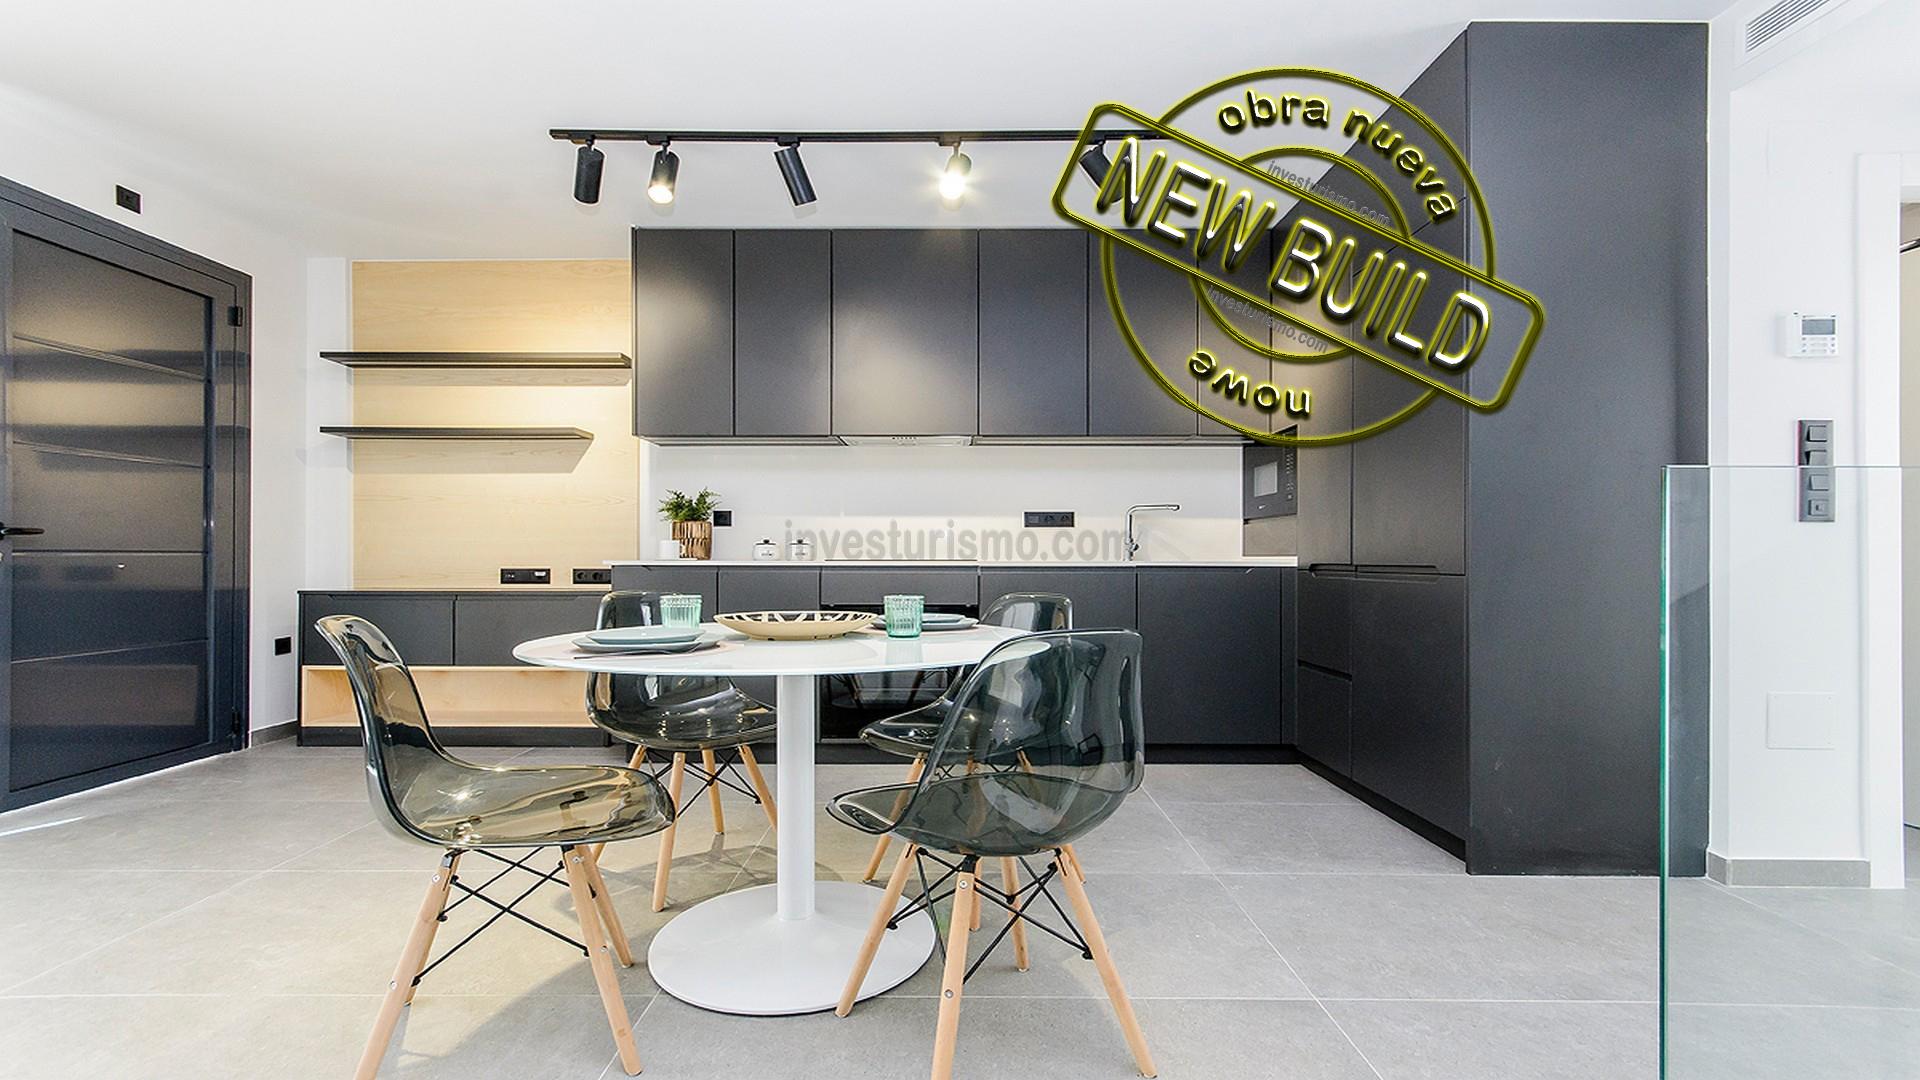 New build 3 bedrooms Townhouses in Guardamar